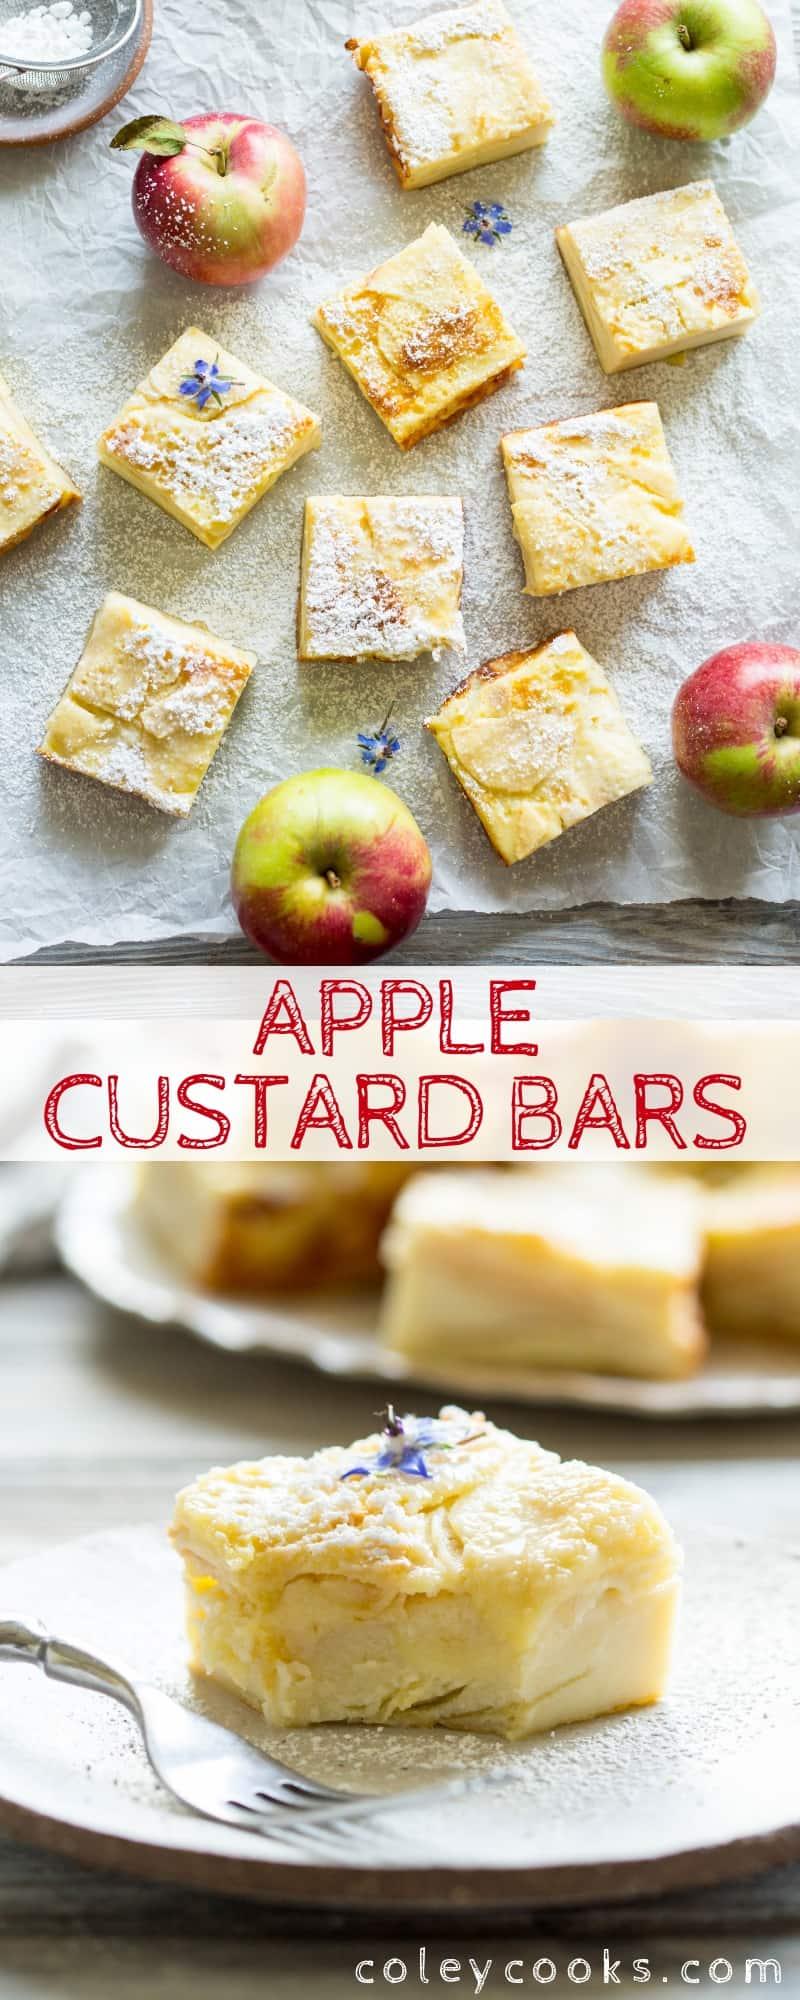 Pinterest collage of an apple custard bar recipe.